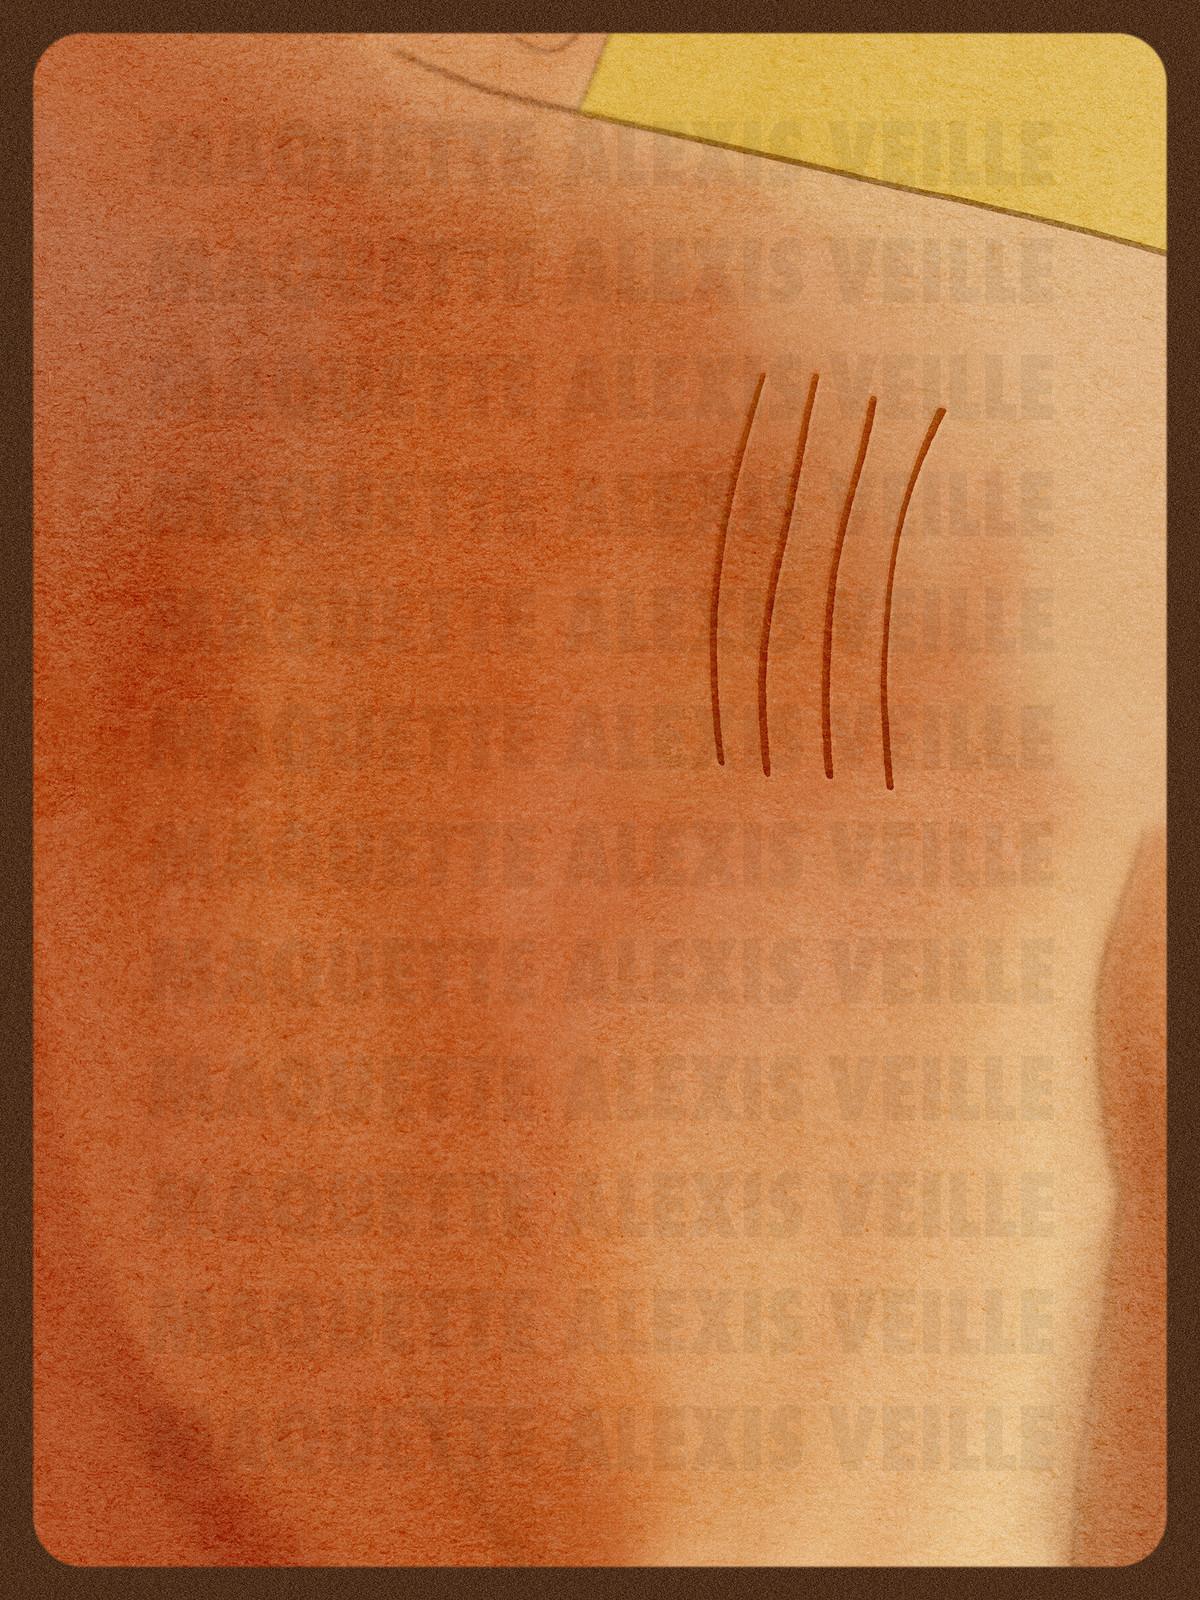 Cicatrice(s) — Alternative